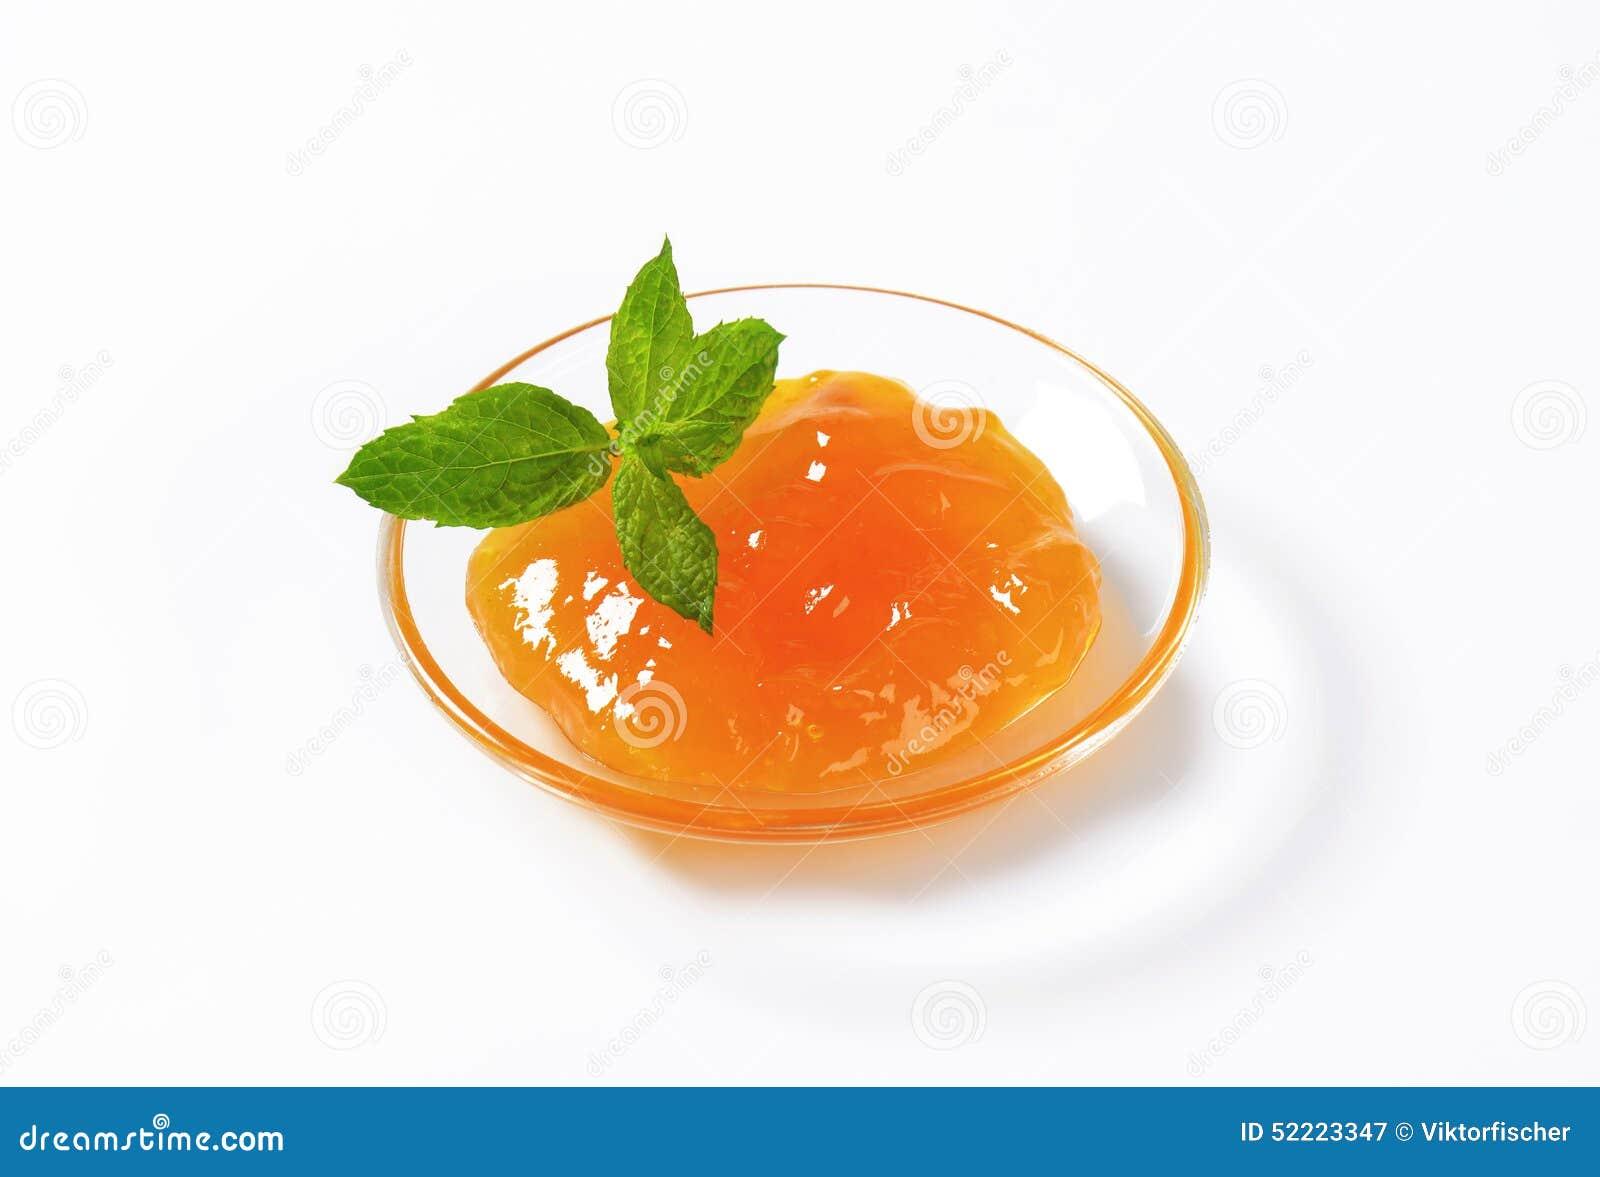 Apricot Jam Stock Photo - Image: 52223347